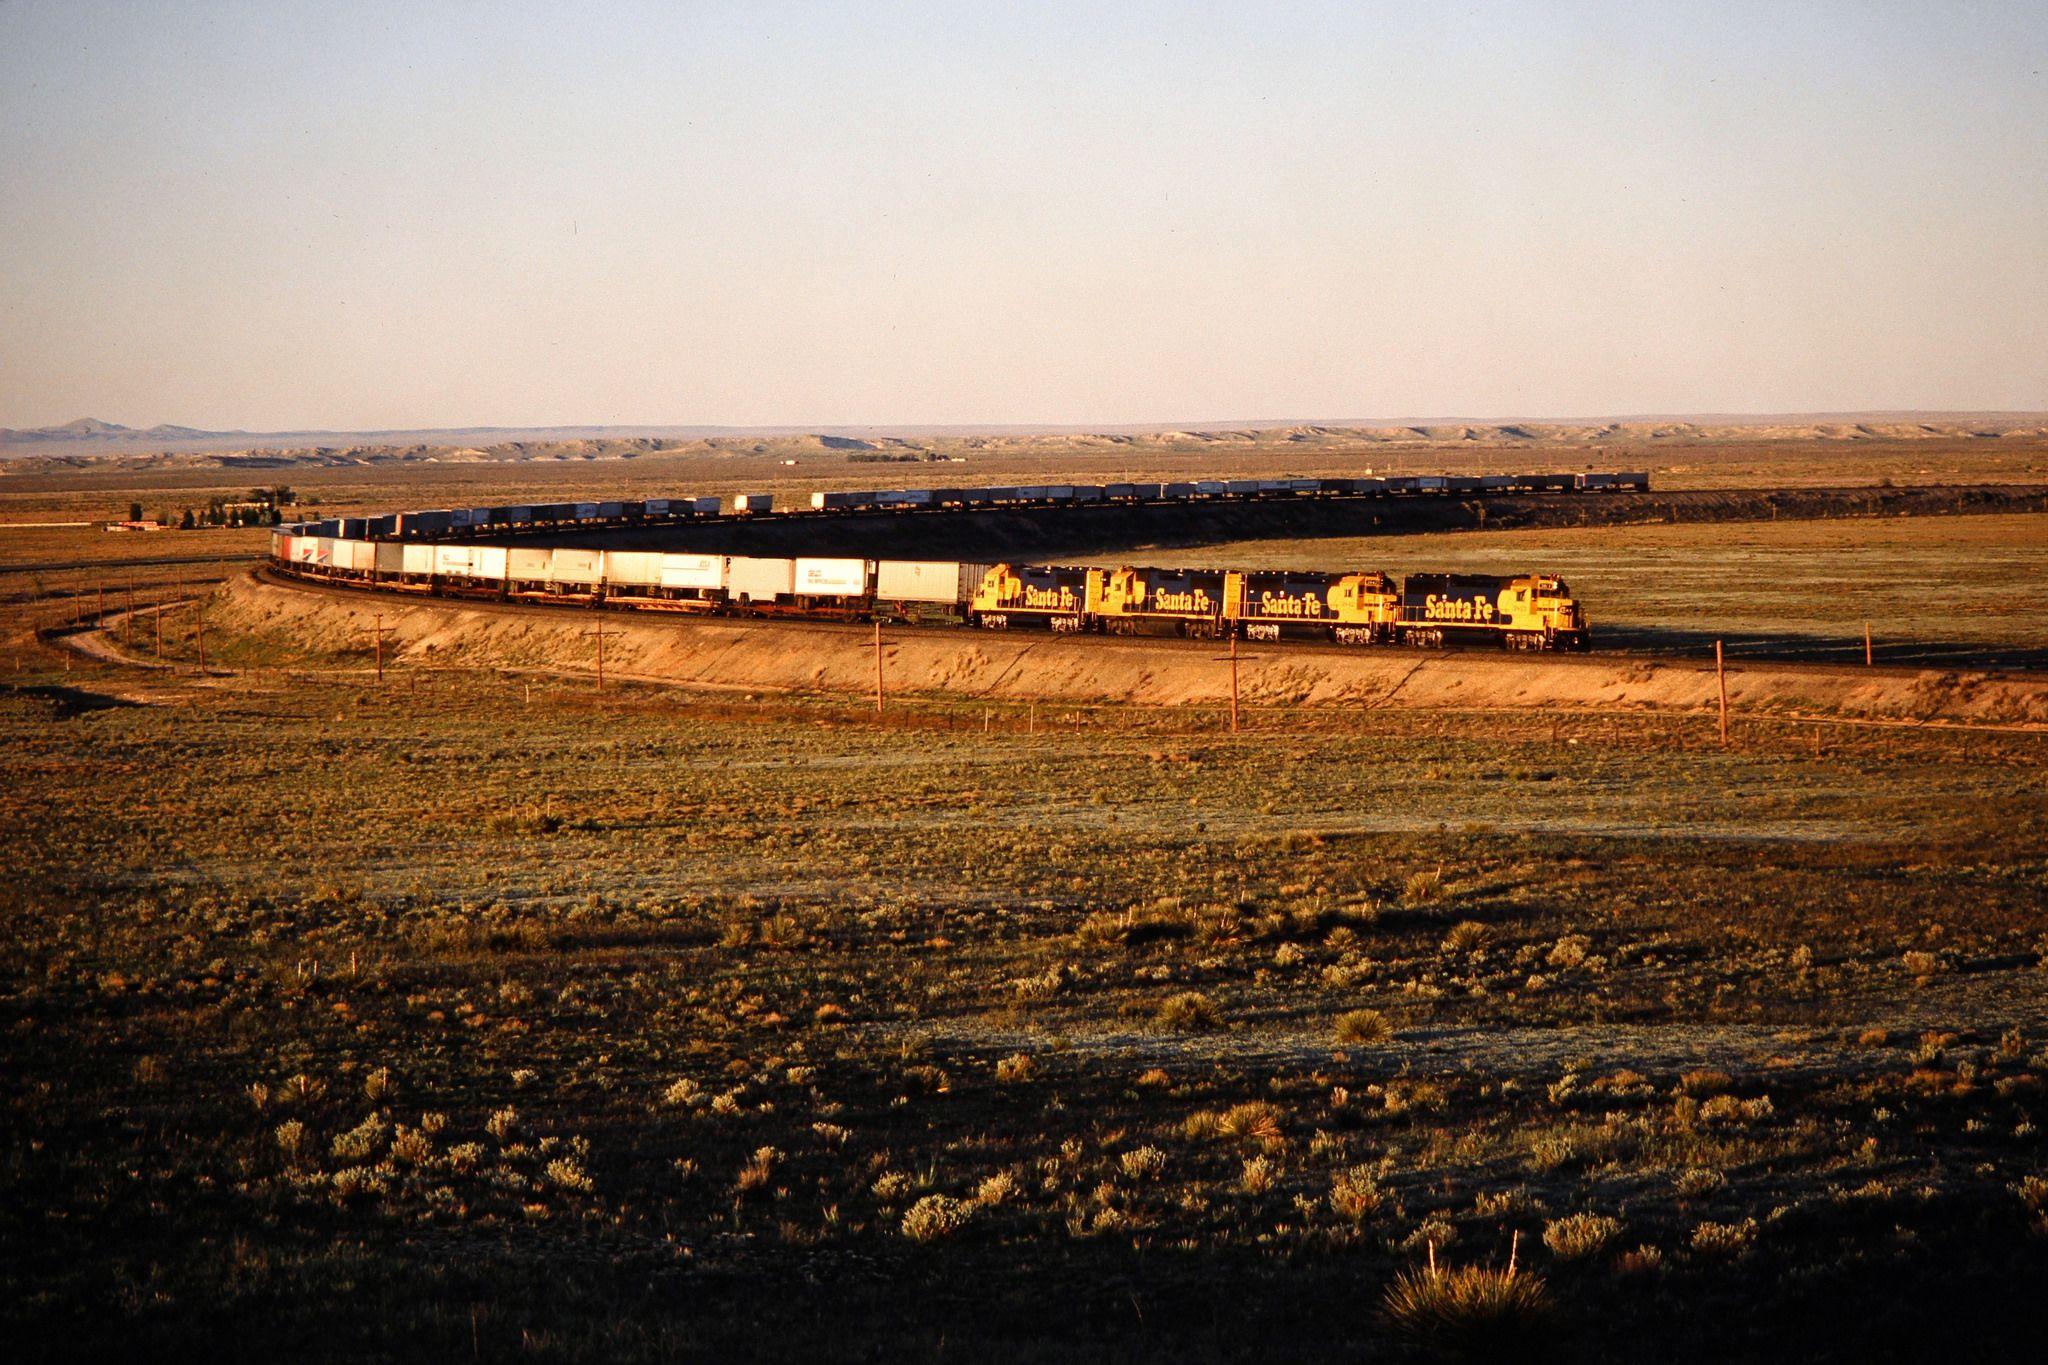 https://flic.kr/p/EDg4NY | ATSF, Willard, New Mexico, 1986 | Westbound Santa Fe Railway freight train in Willard, New Mexico,  on May 5, 1986. Photograph by John F. Bjorklund, © 2015, Center for Railroad Photography and Art. Bjorklund-05-06-07